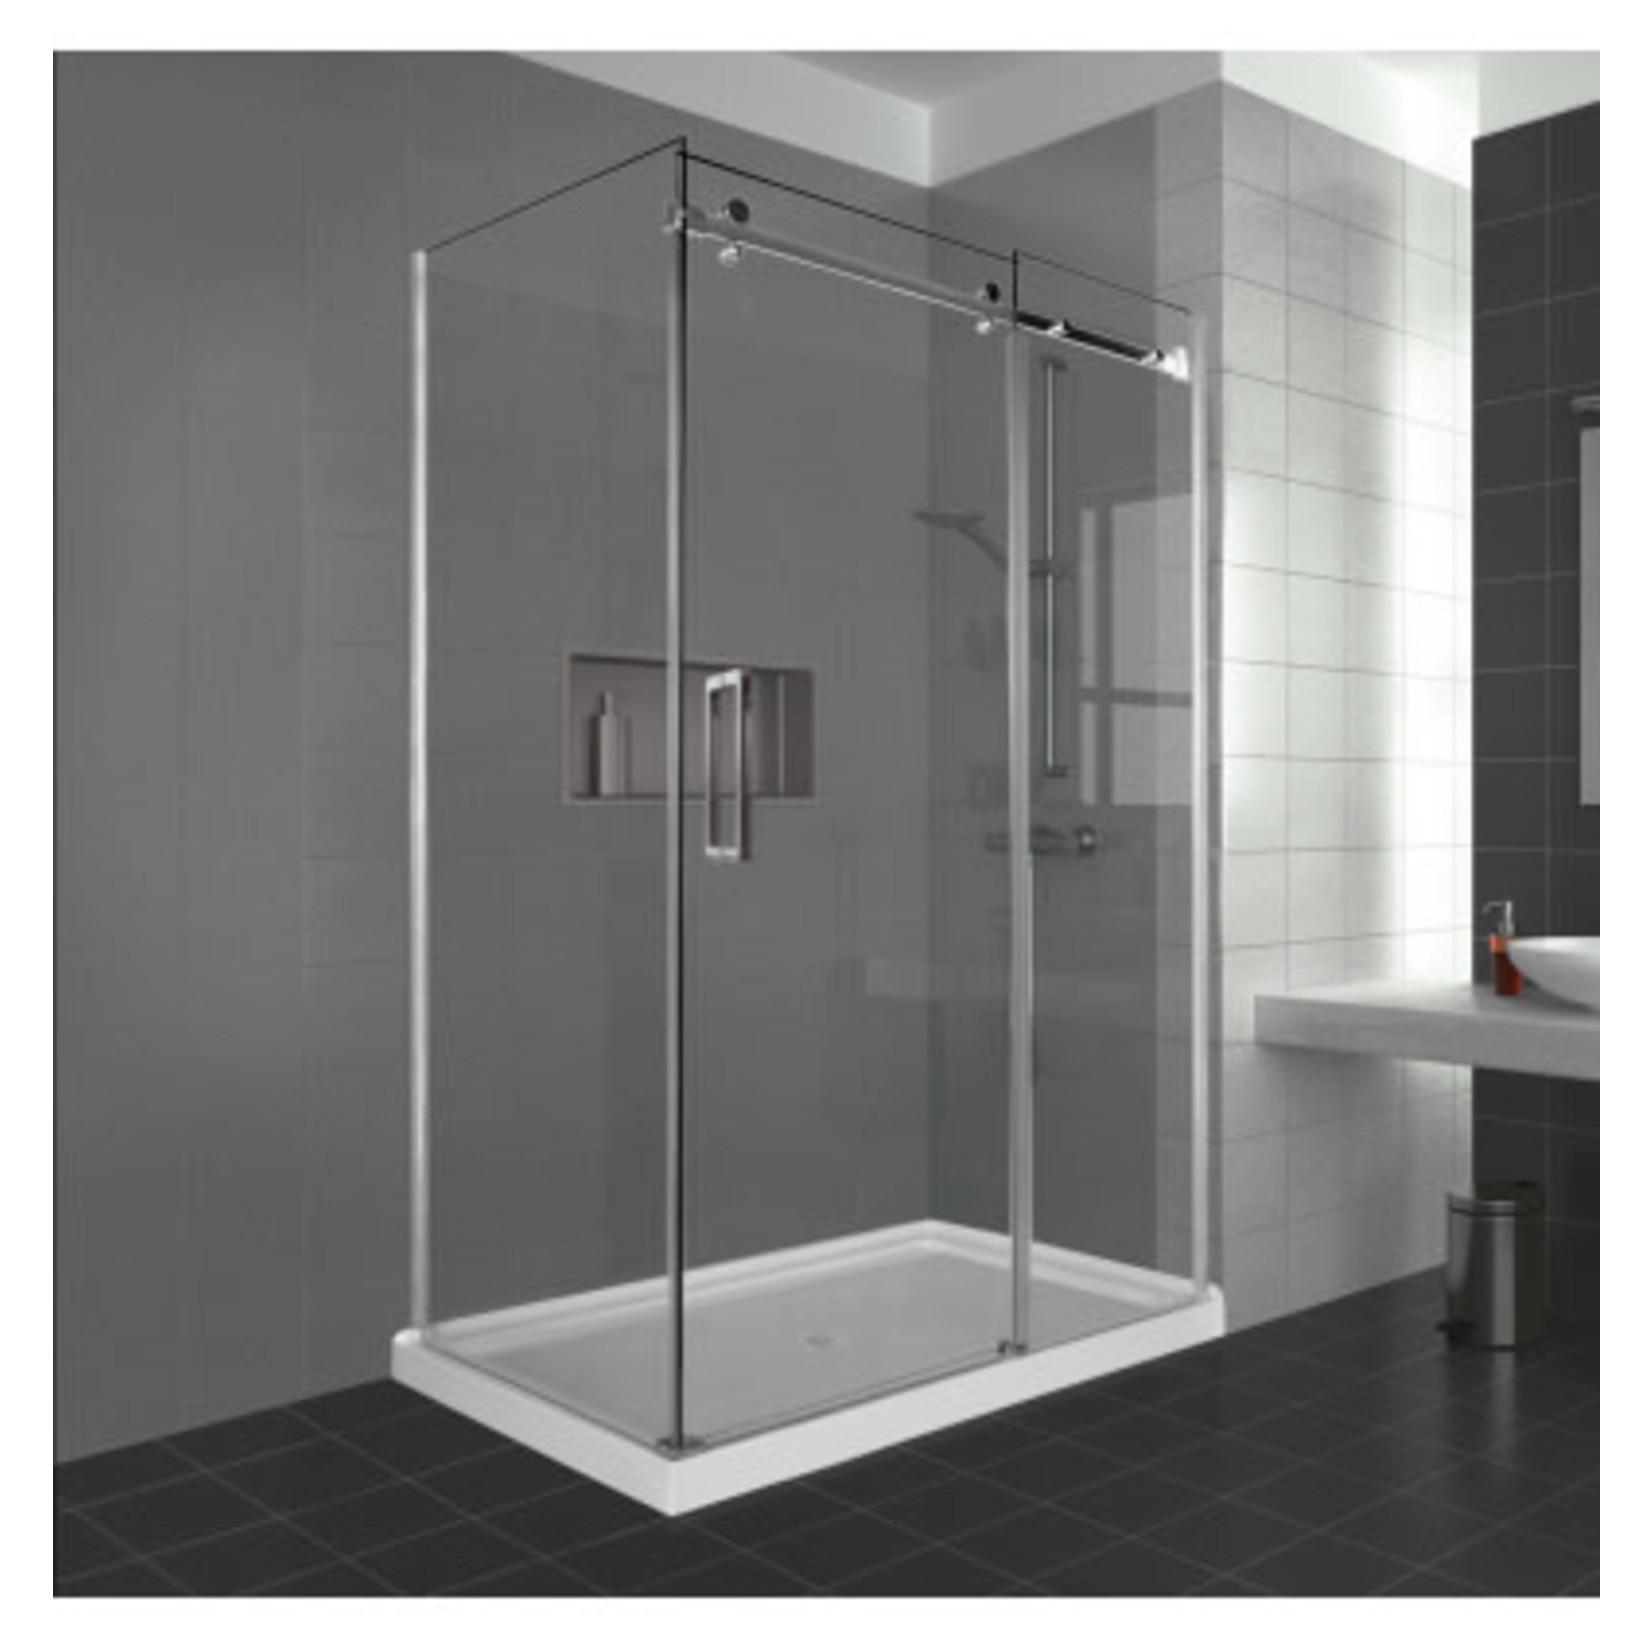 Reversible shower set 36x48 chrome Caruso Nautika series